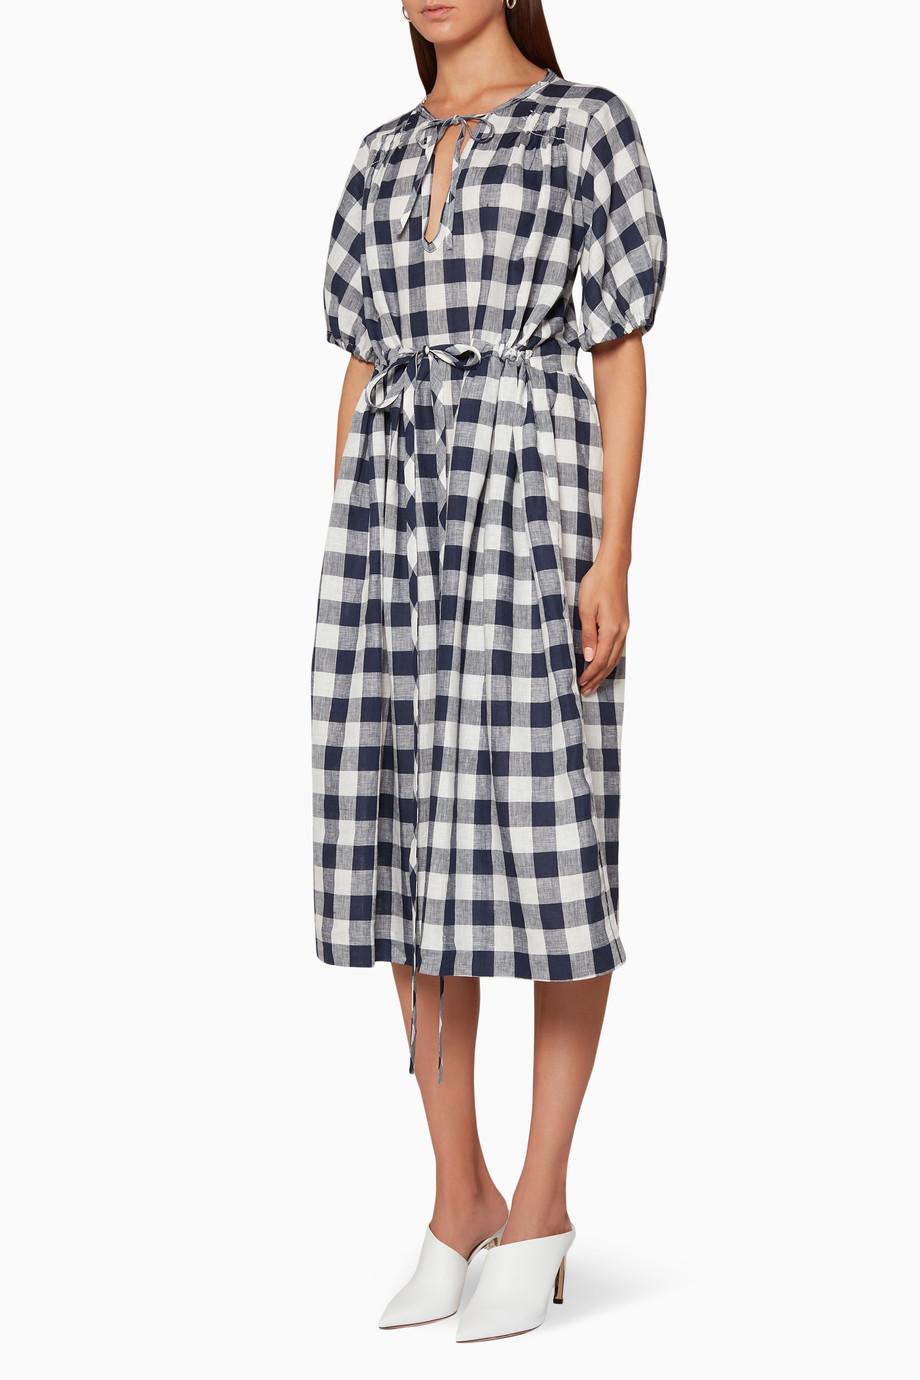 fe866c41831 Shop Lee Mathews Multicolour Navy   White Nellie Gingham Dress for ...